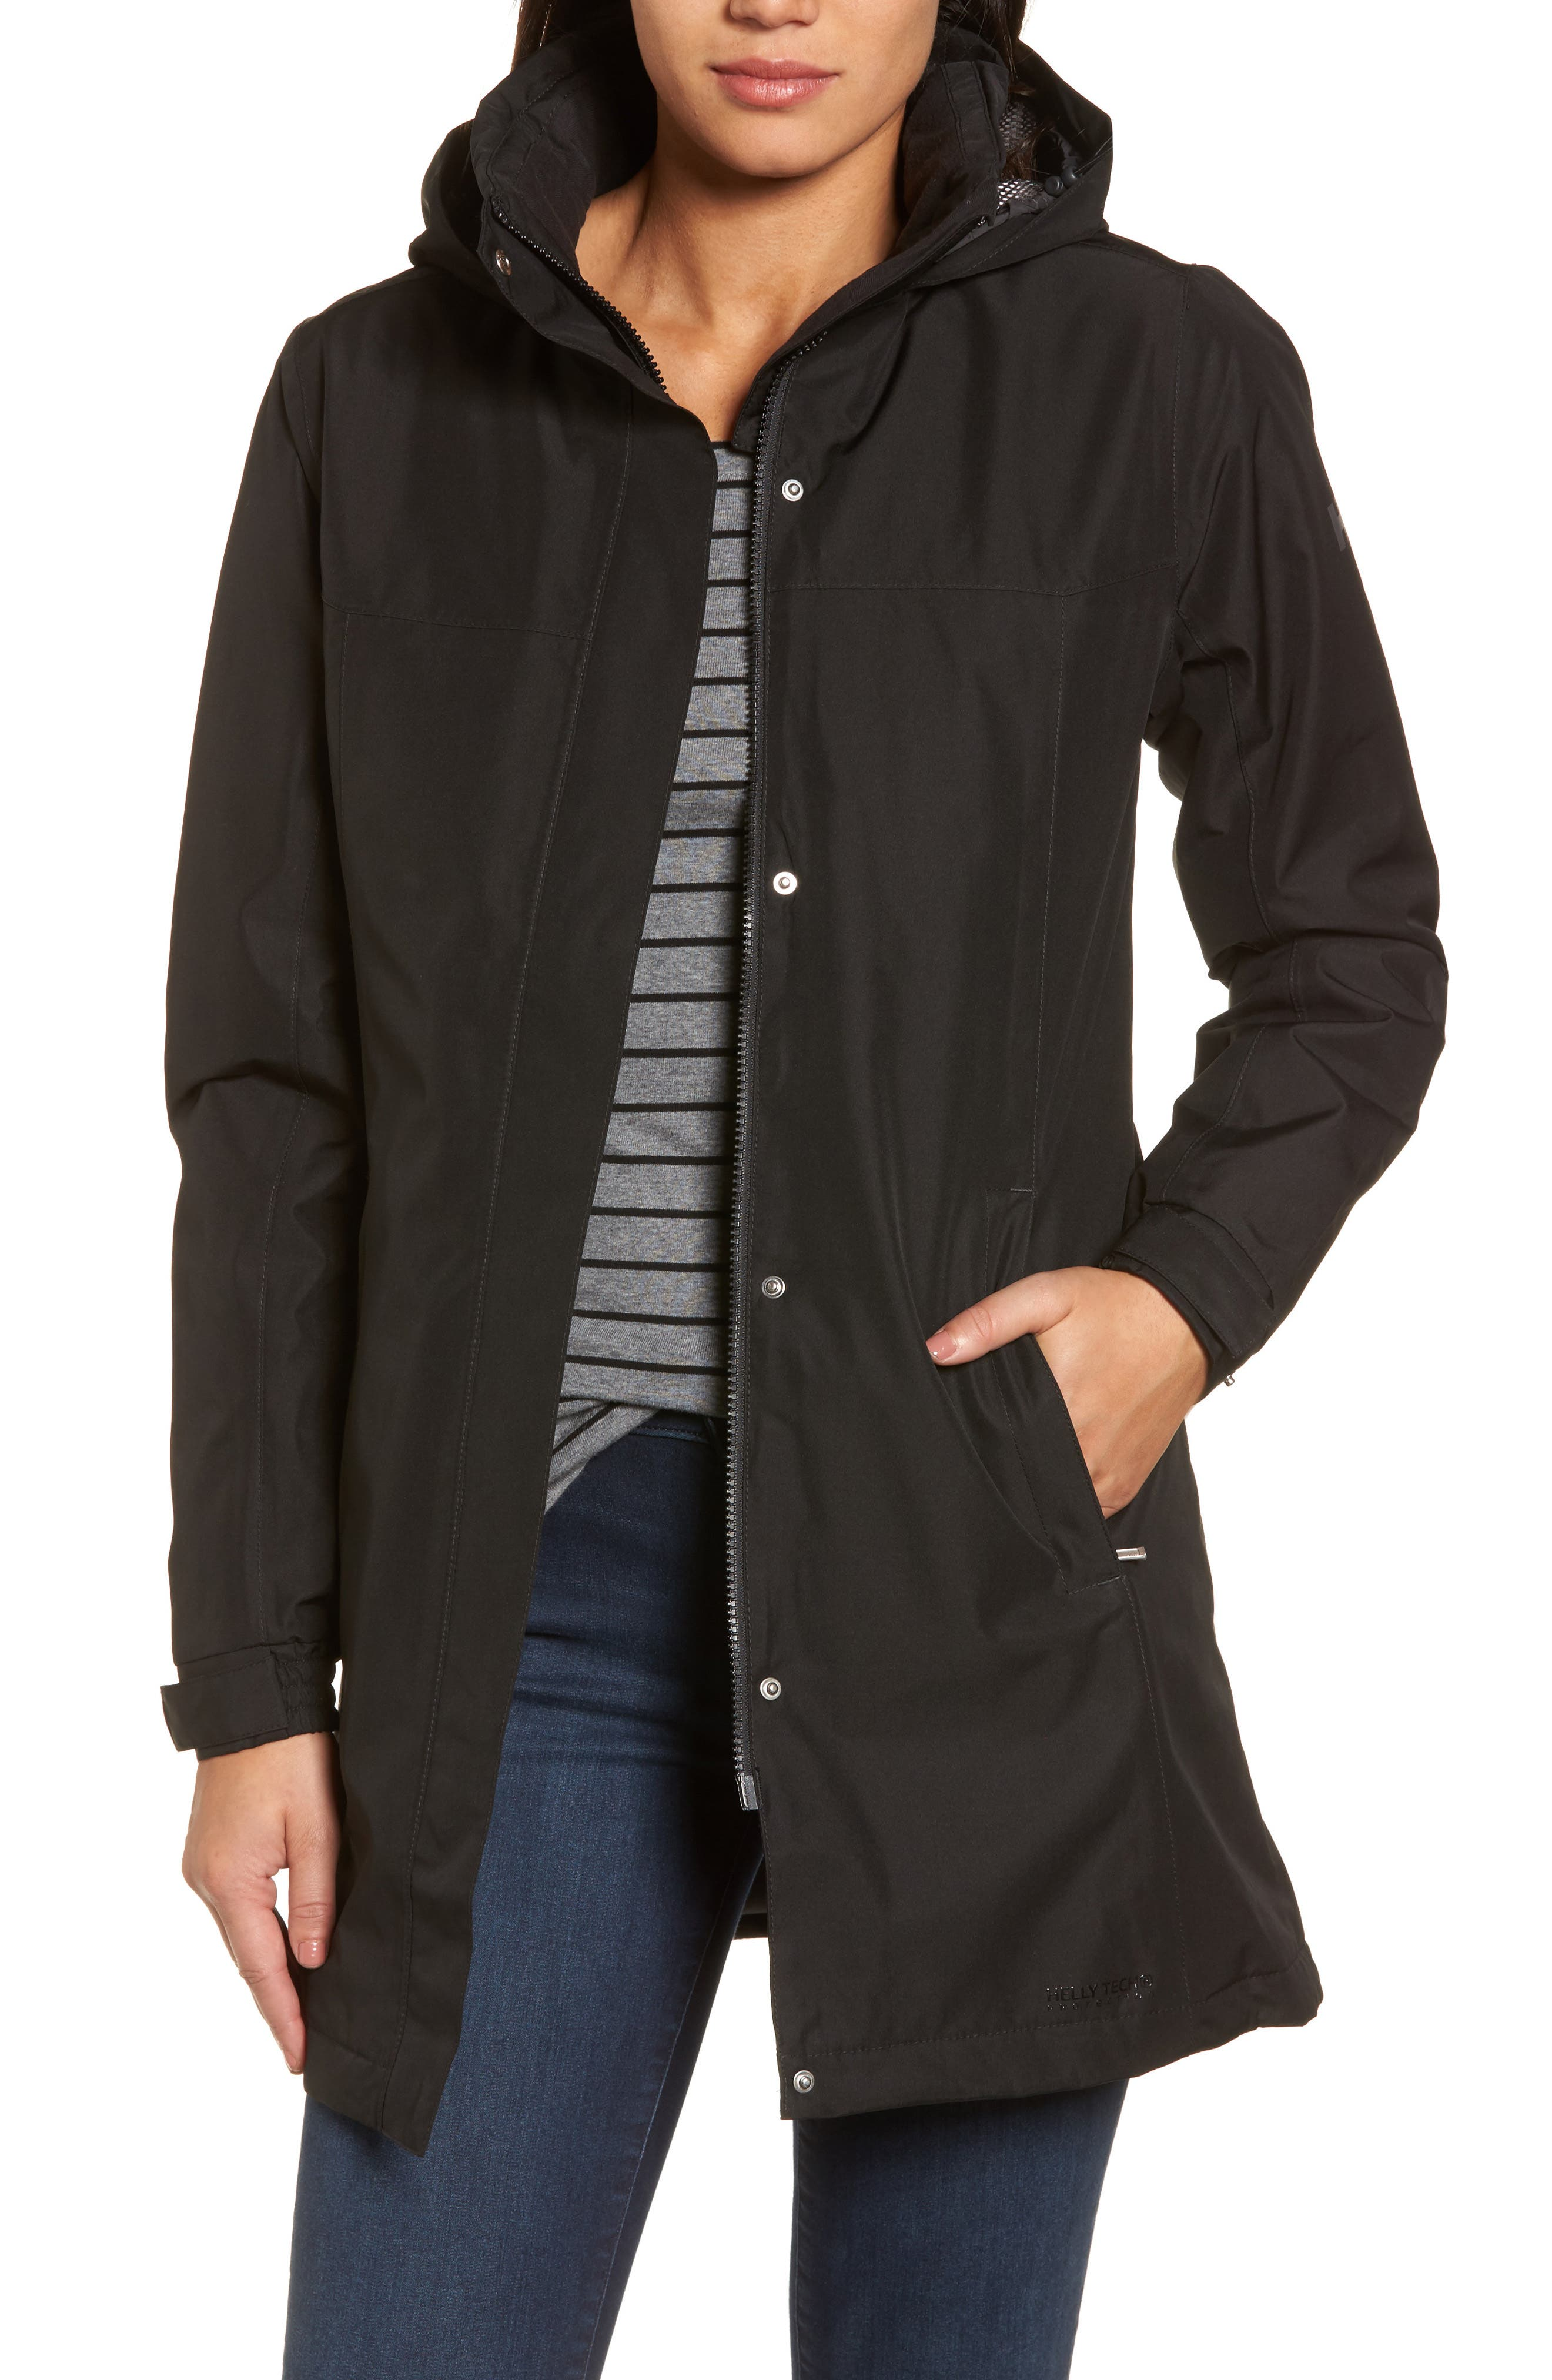 Aden Hooded Insulated Rain Jacket,                         Main,                         color, Black